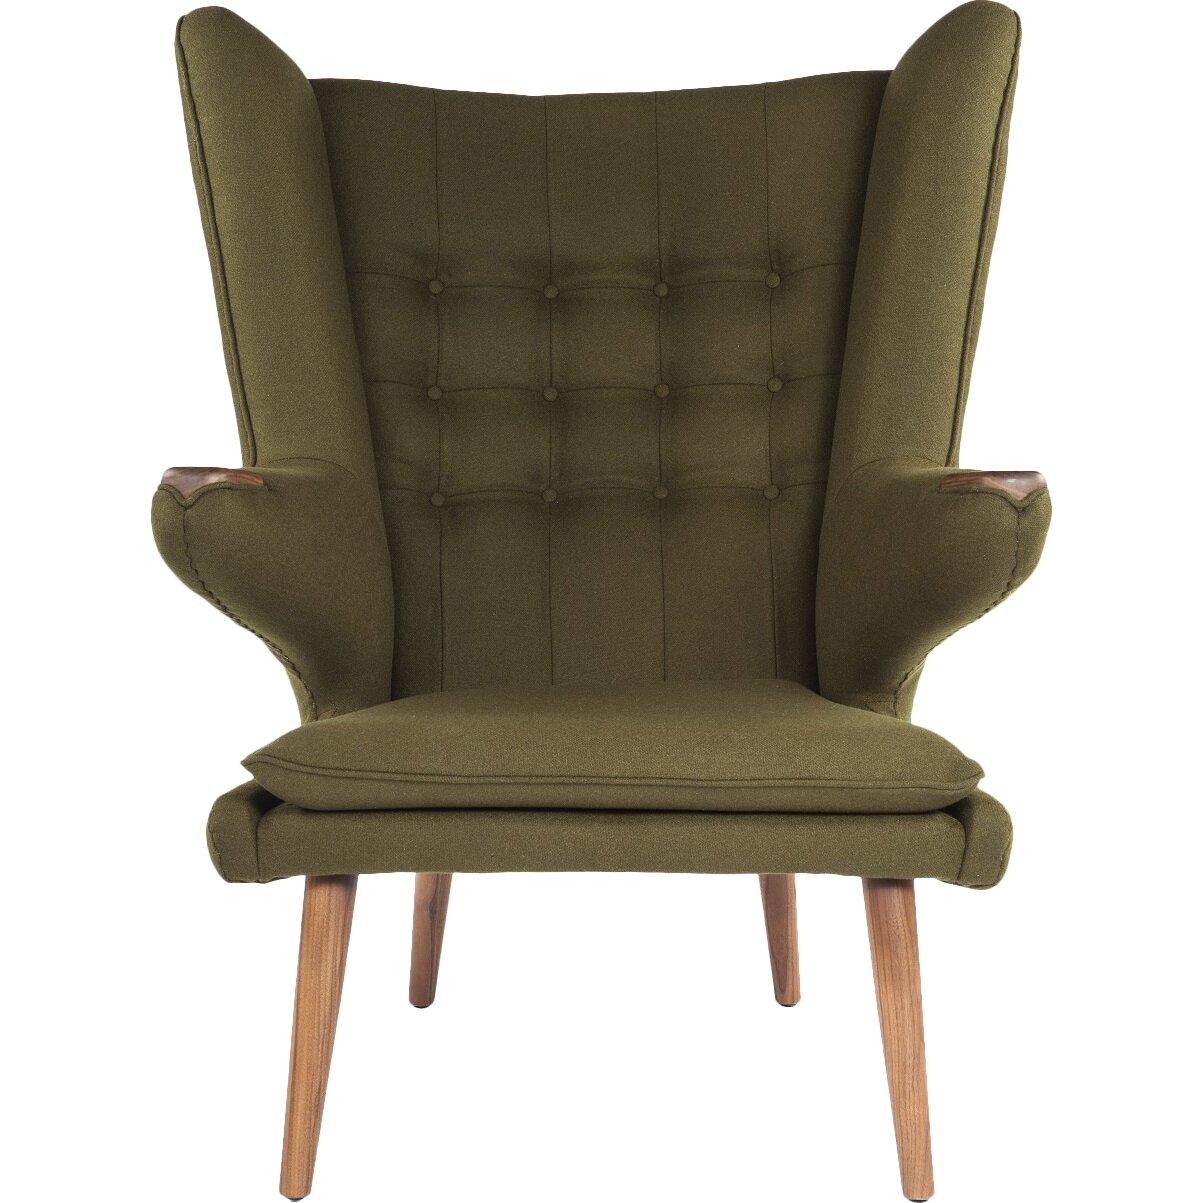 Stilnovo The Olsen Lounge Chair with Ottoman